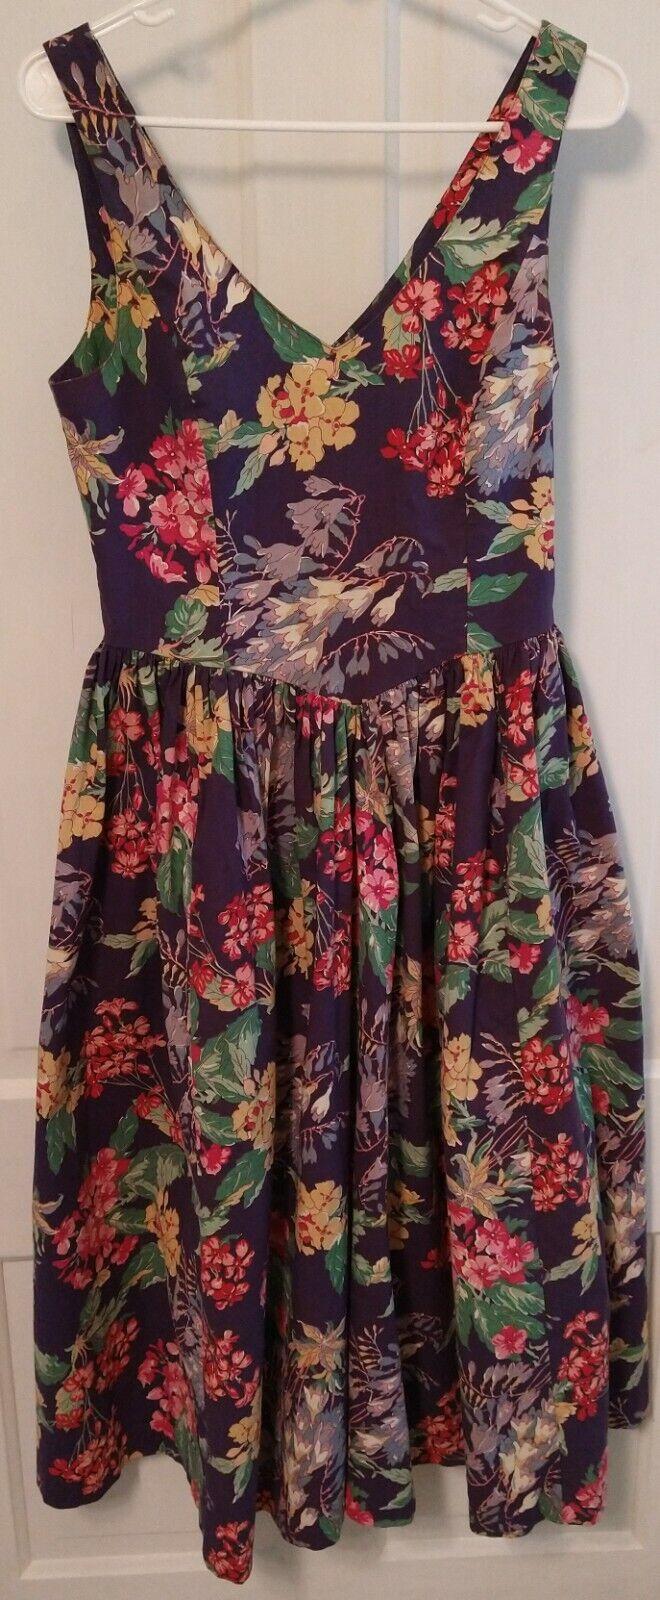 Vintage Laura Ashley Floral Sundress 80s-90s Purp… - image 1